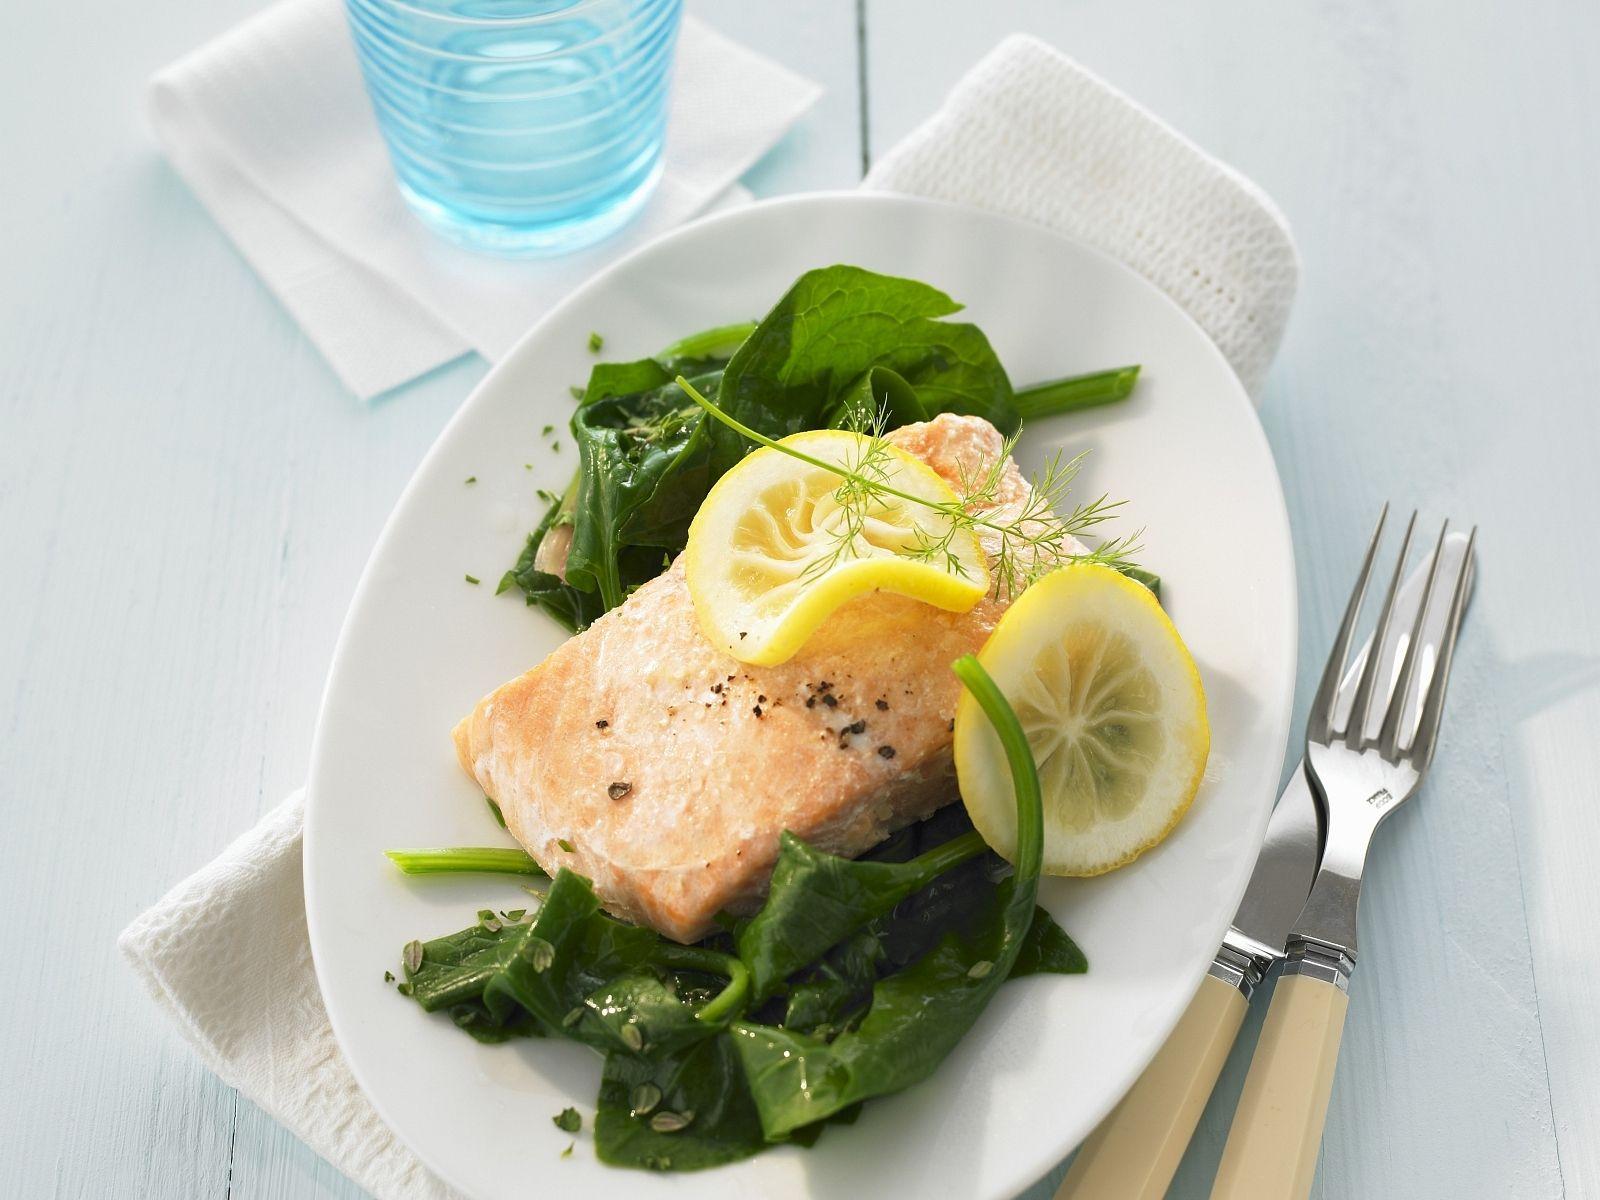 Rezeptideen Sommerküche : Sommerküche ernährung rezepte und mehr eat smarter